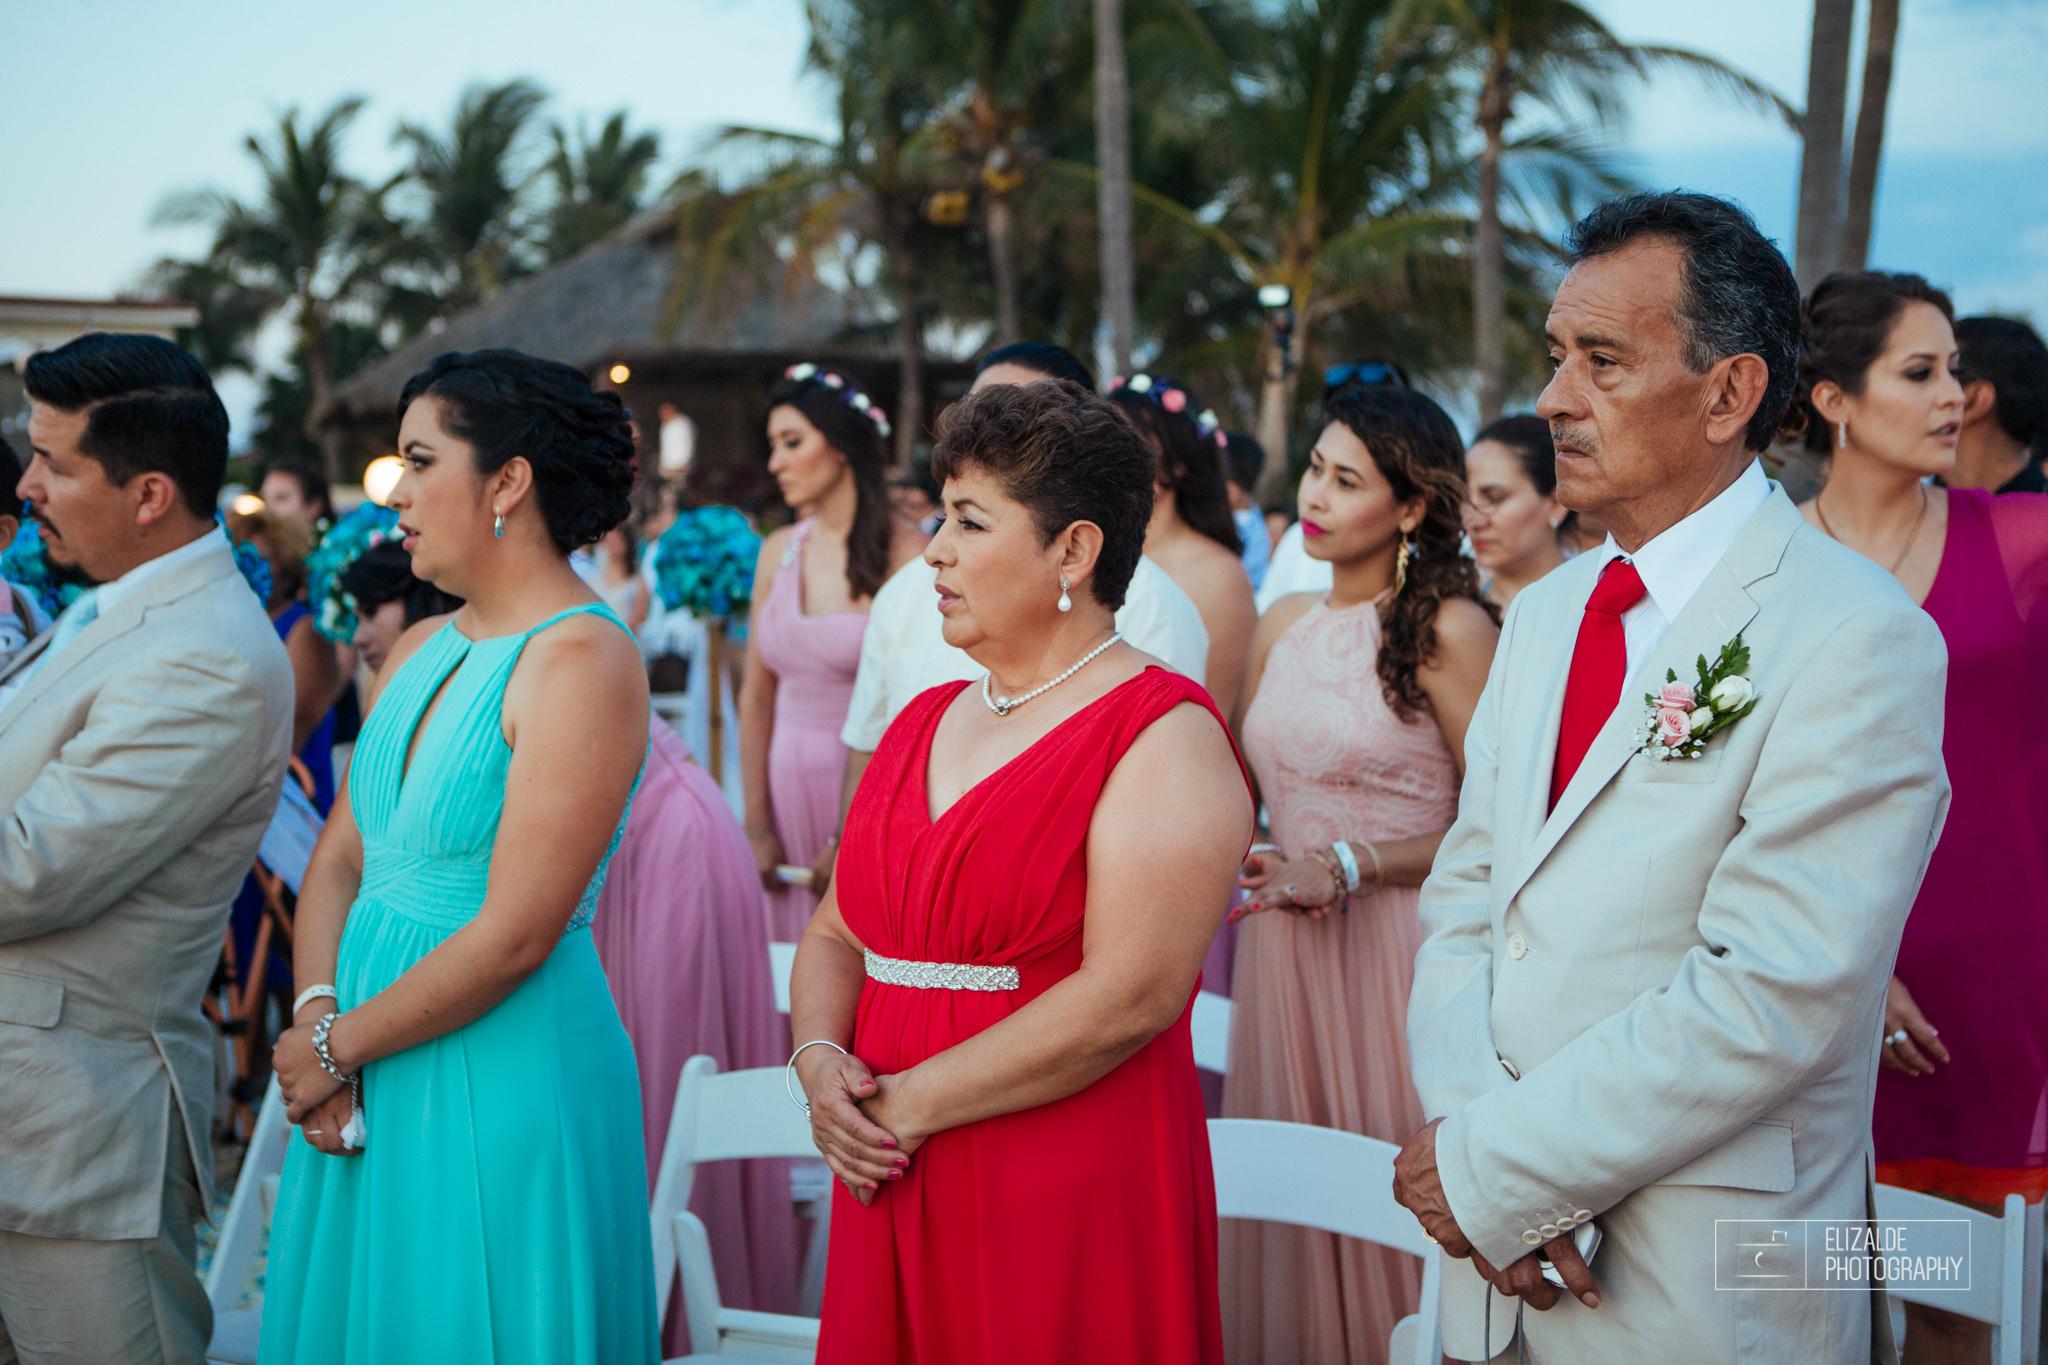 Pay and Ferran_Acapulco_Destination Wedding_Elizalde Photography-101.jpg